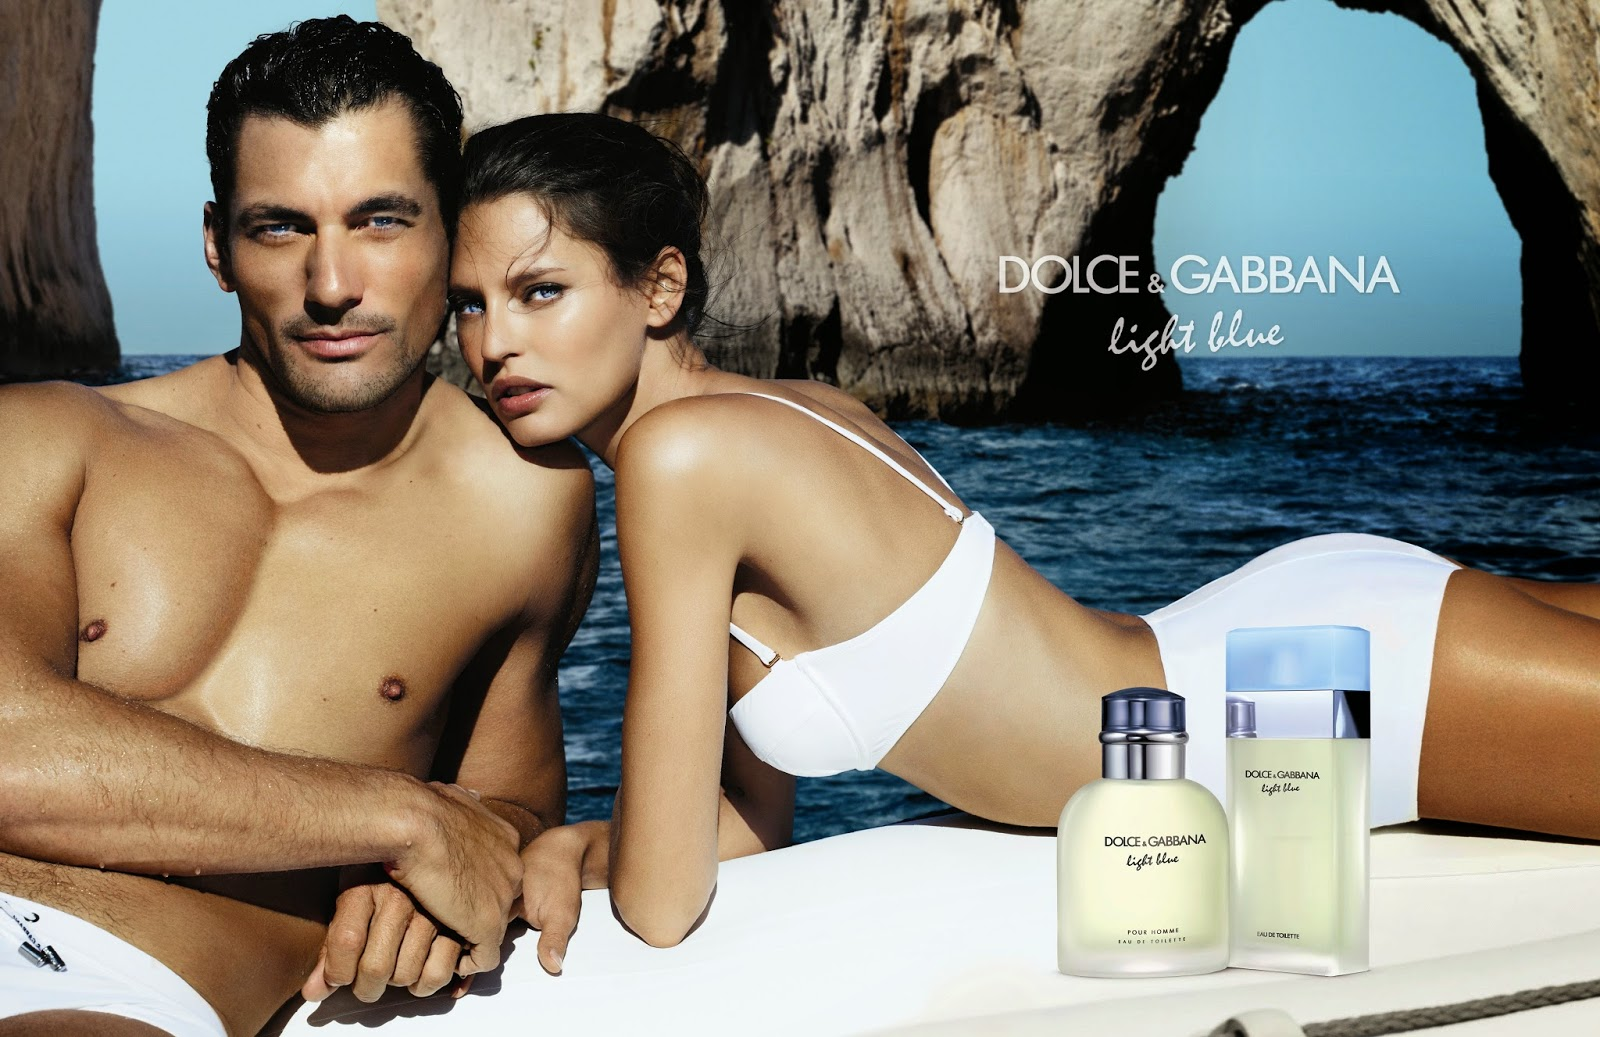 [Sponsored Video] Dolce & Gabbana's Light Blue, a Mediterranean Love Story